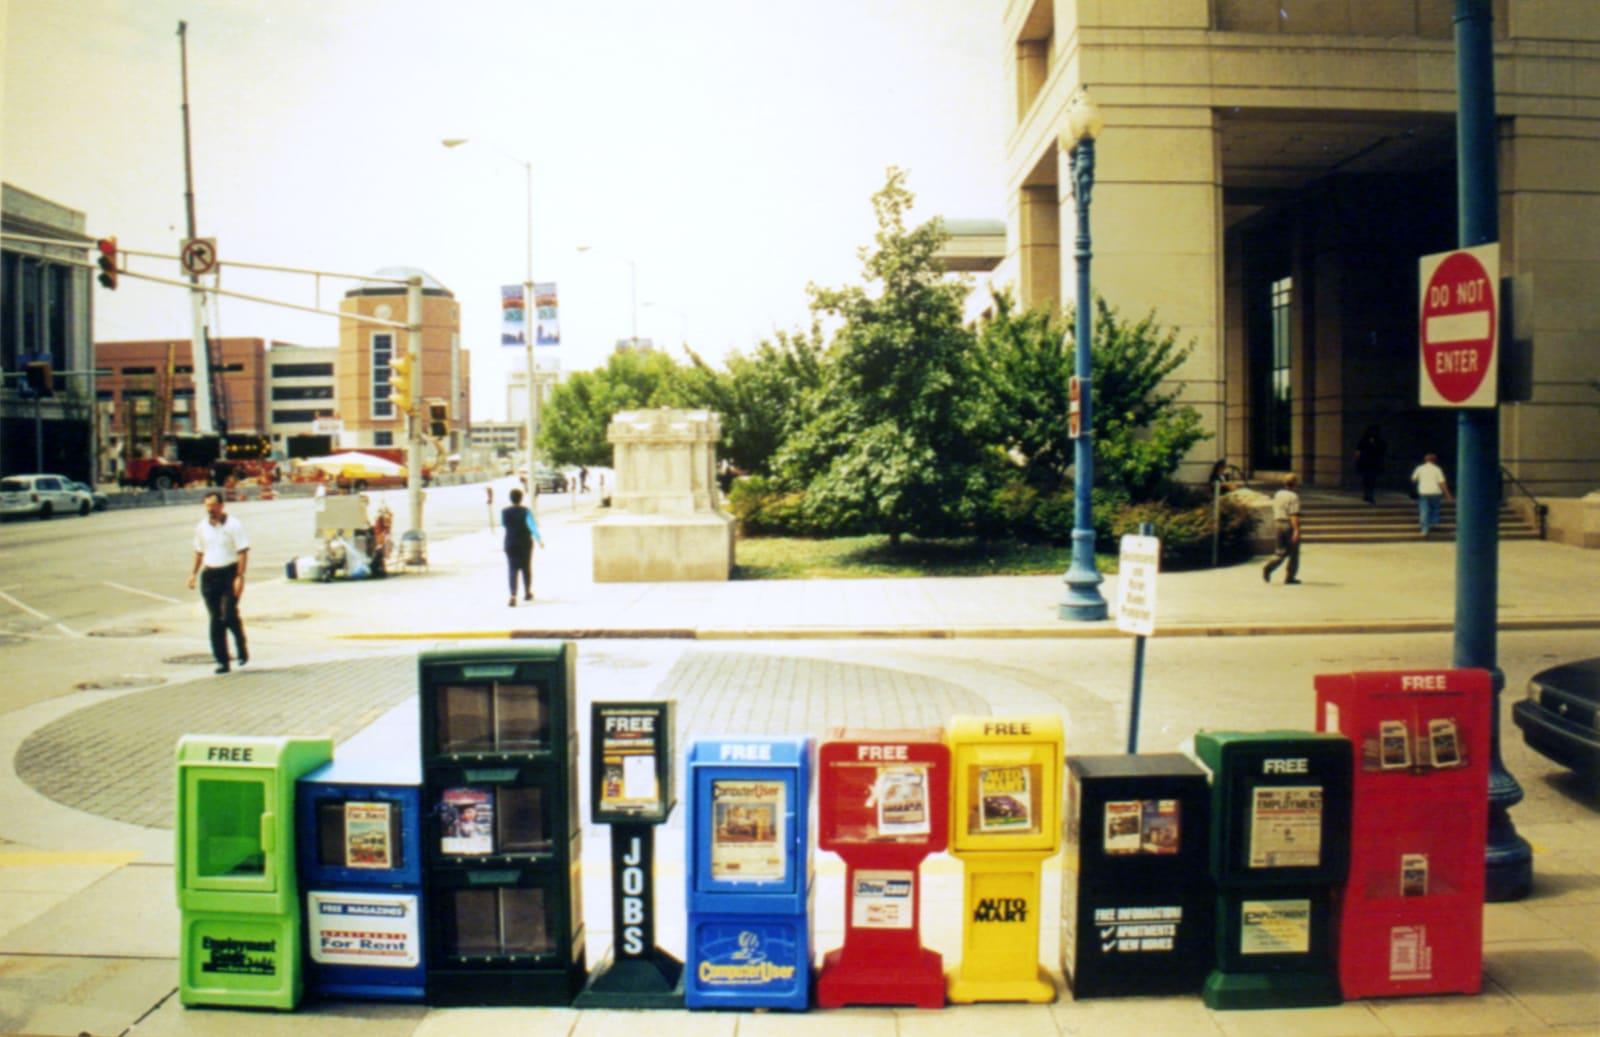 Stands, photograph, 122 x 183 cm, 2000